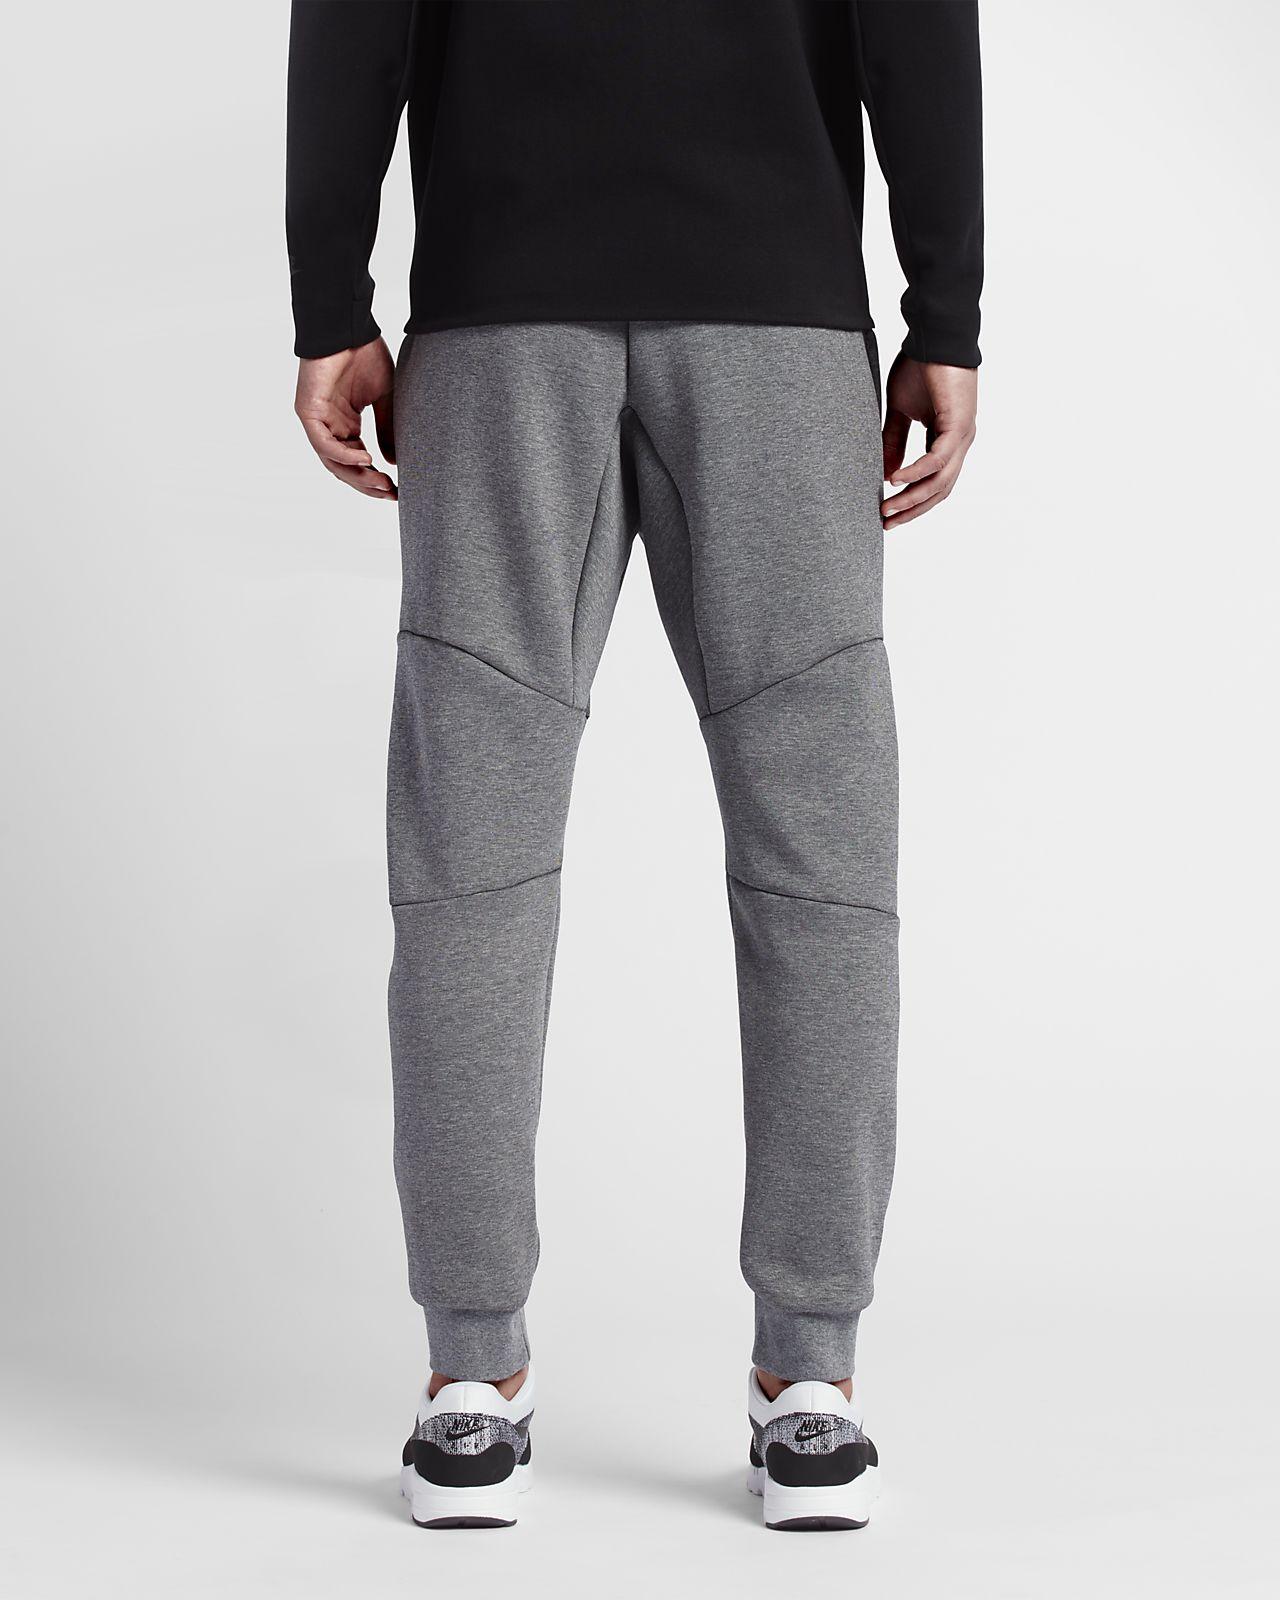 Nike Mens Pants - Nike Air Jordan Fleece Dark Grey Heather/Black H27l2650